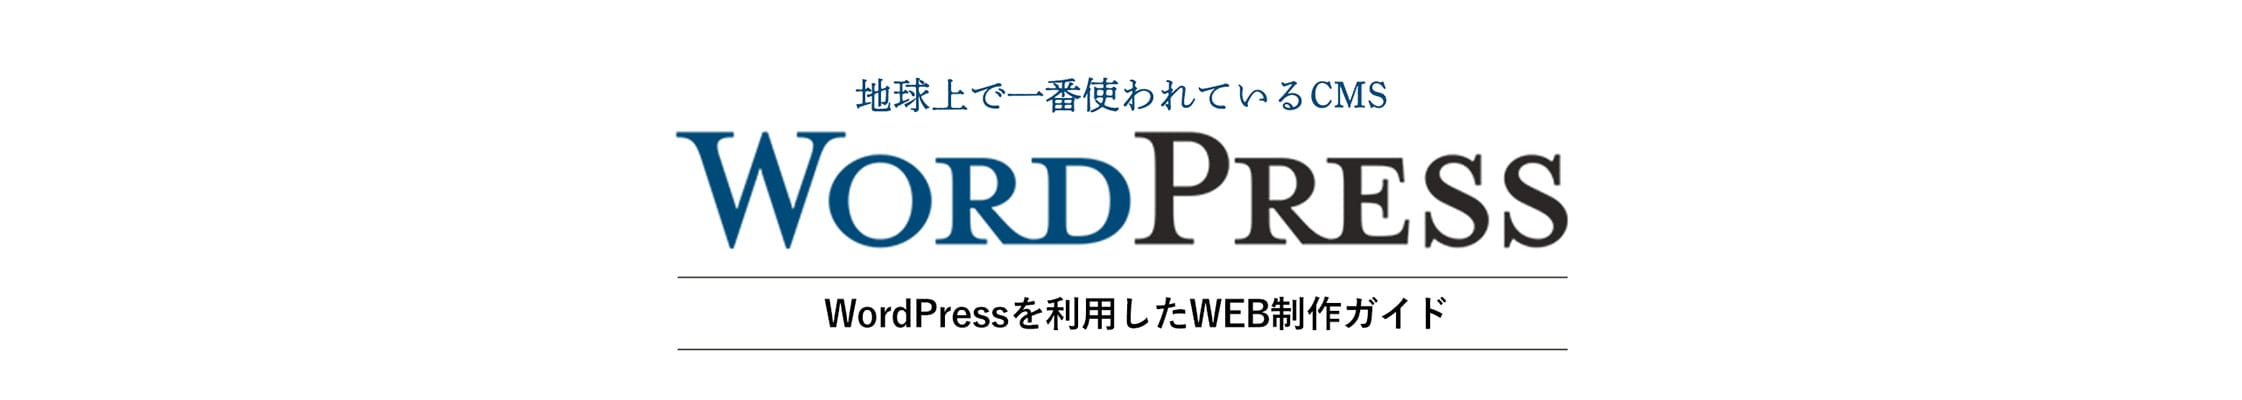 WordPressによるサイト制作 WordPressを使ったホームページ制作、WordPressでのWEB制作ガイド、WordPressとは何か、WordPressを使えばできること、WordPress制作の手順、費用の目安などをご紹介。